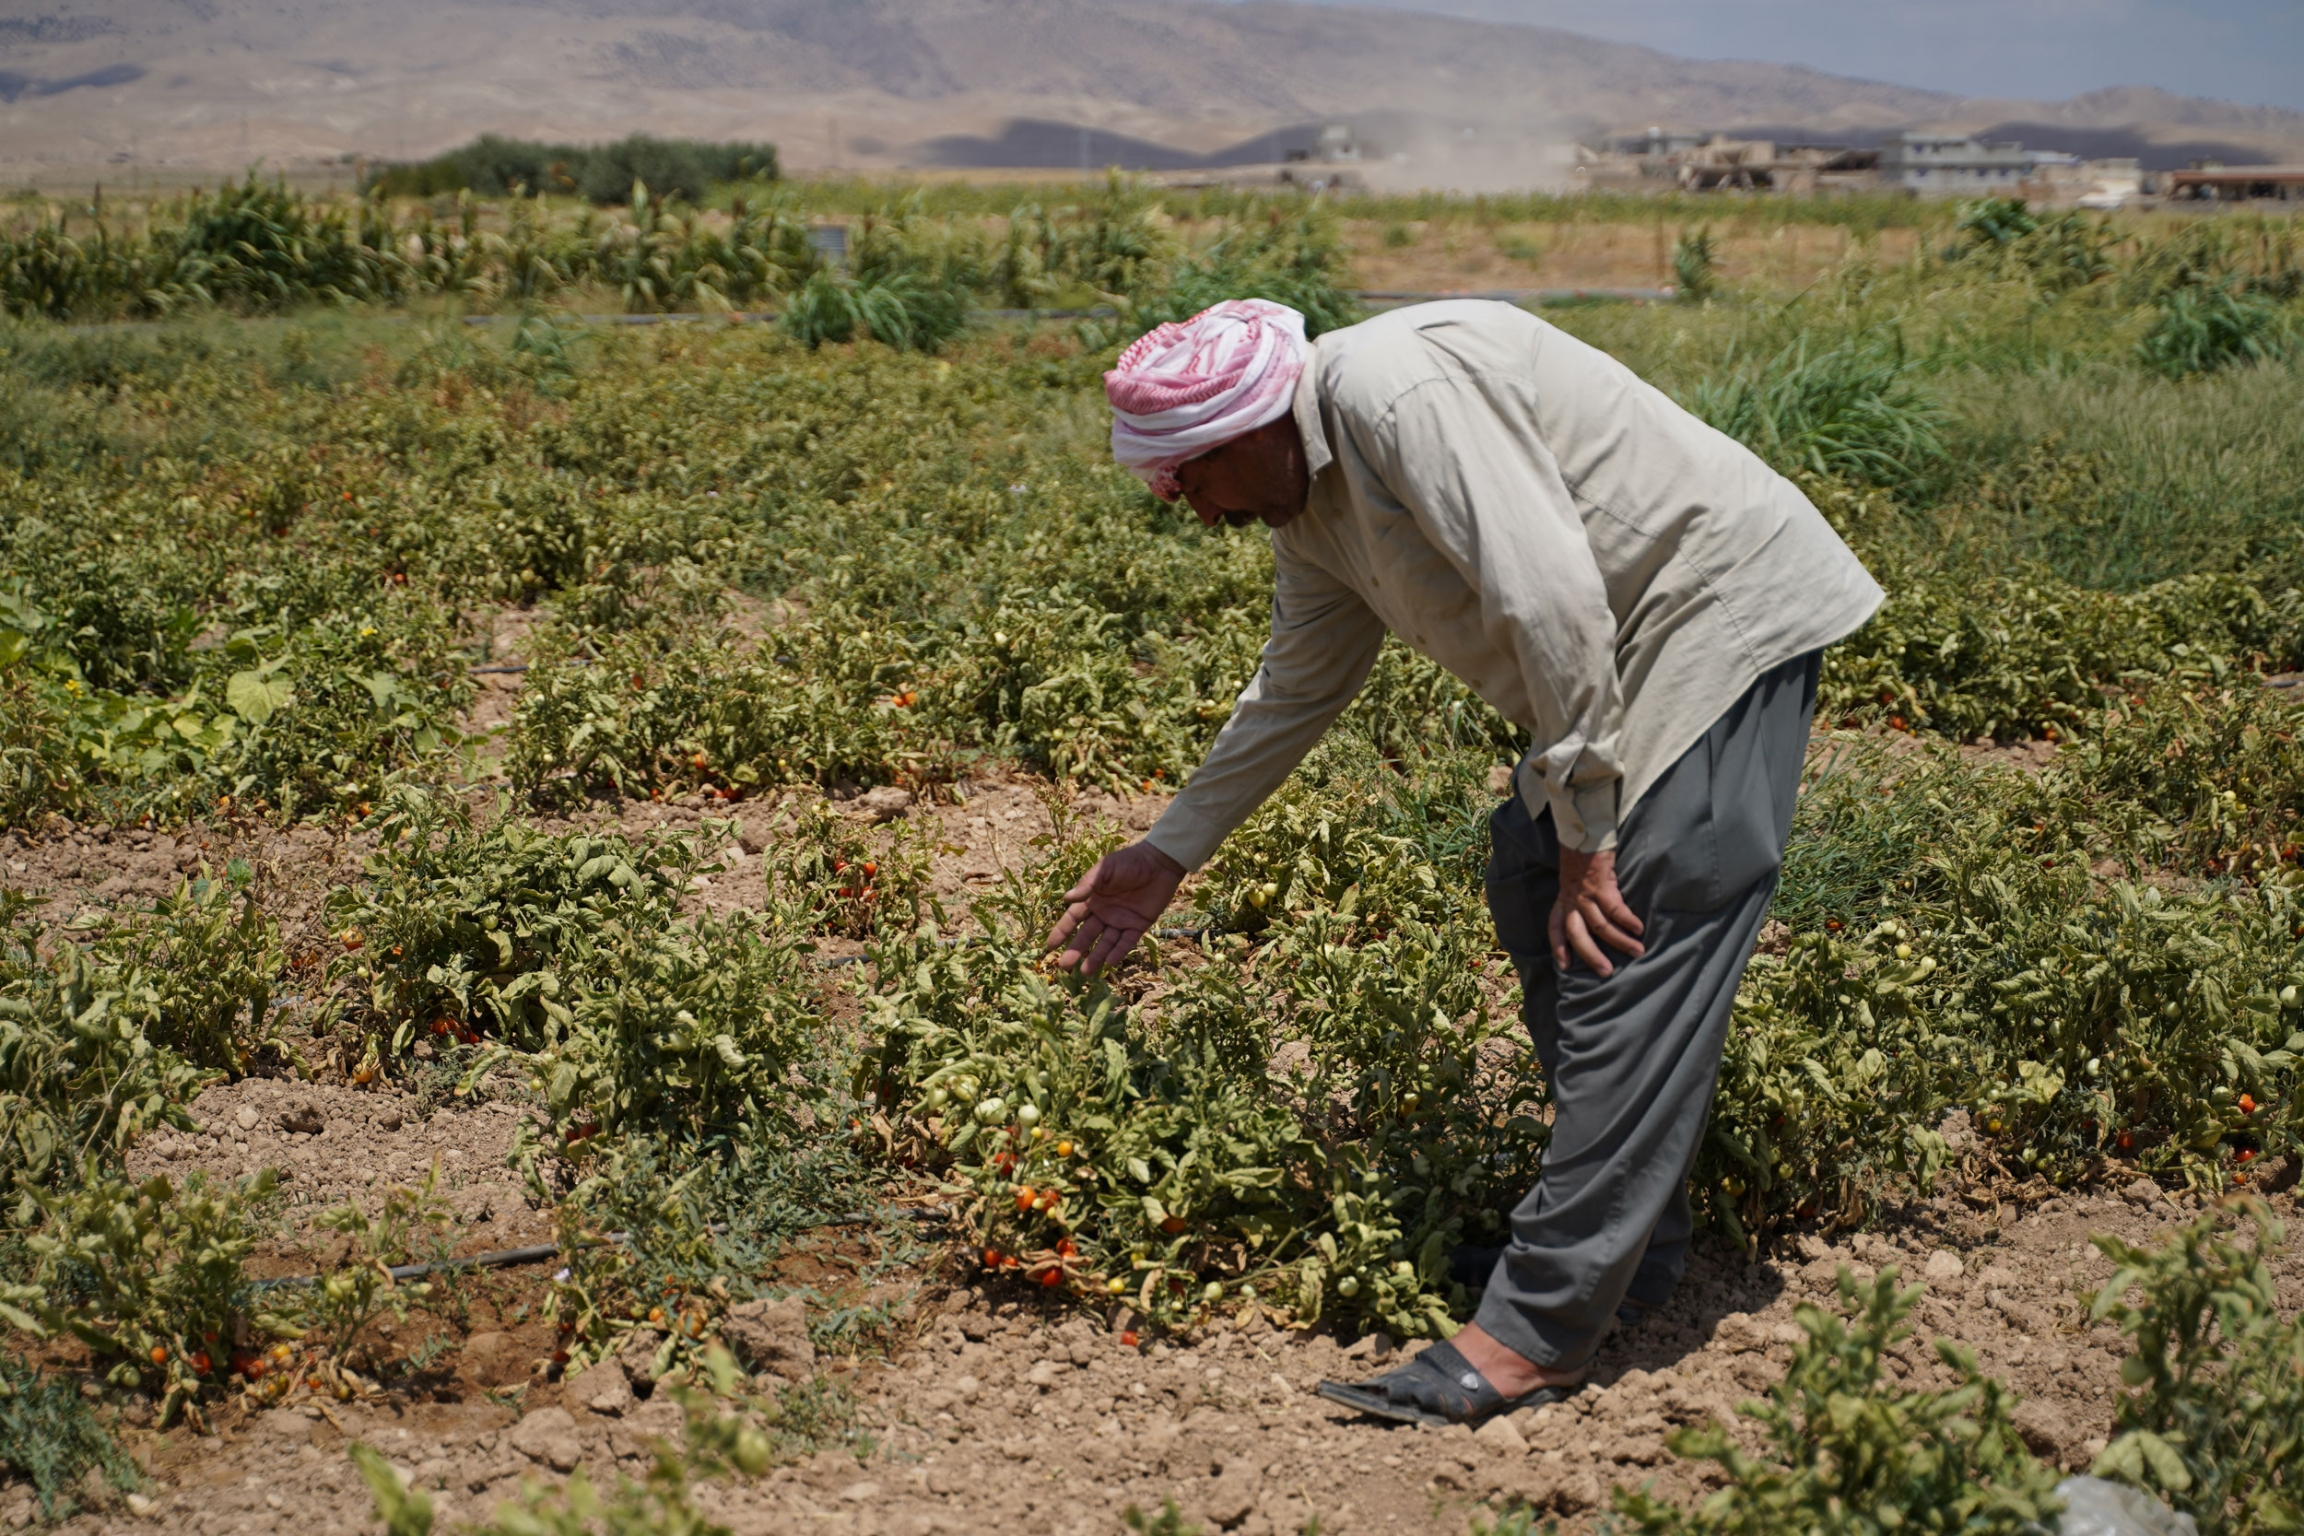 Haji Hassa at his farm, showing how the drought is impacting the farm and plants, Kuri Jami village, Sinjar, August 2021.